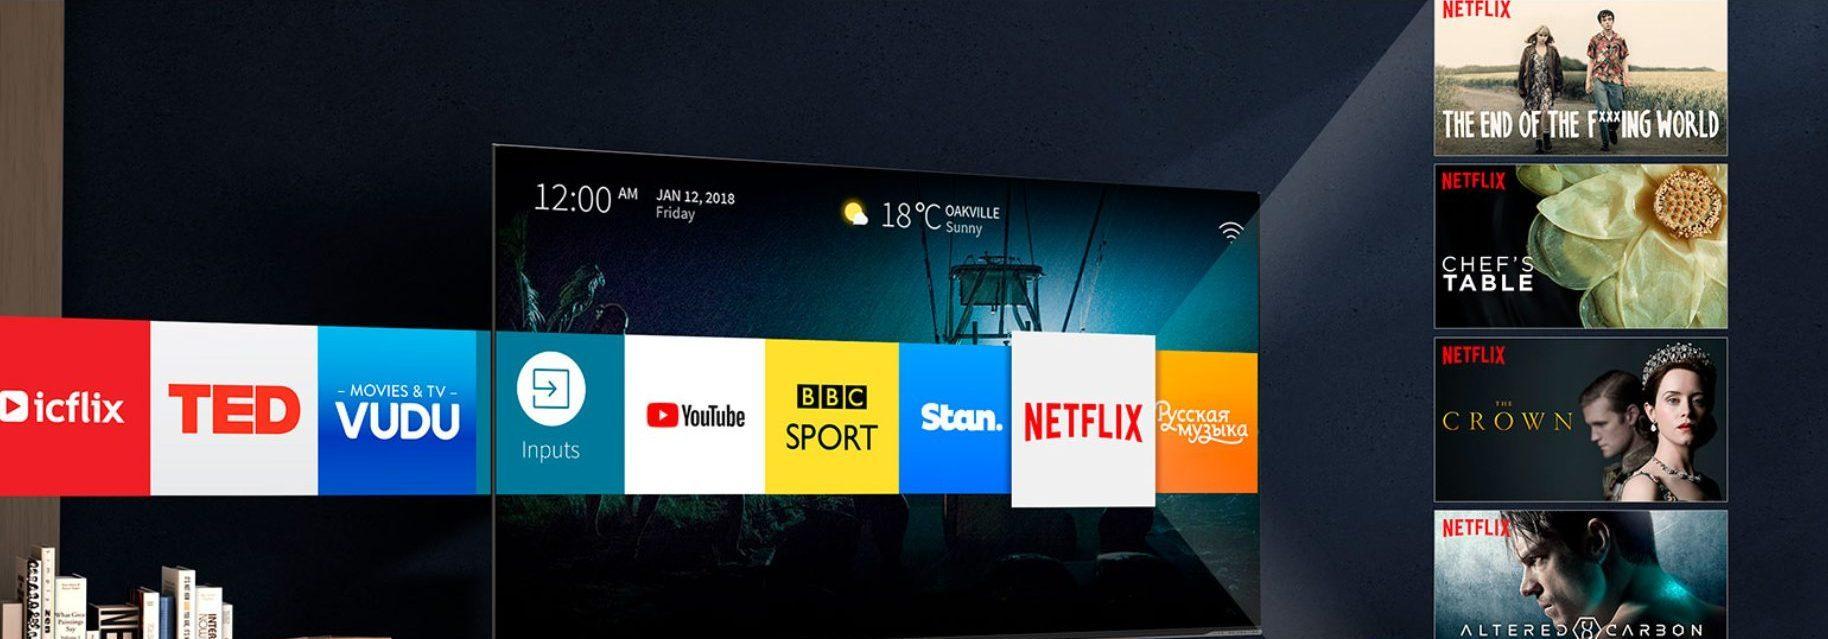 La tele incluye la plataforma inteligente VIDAA U en 2.5